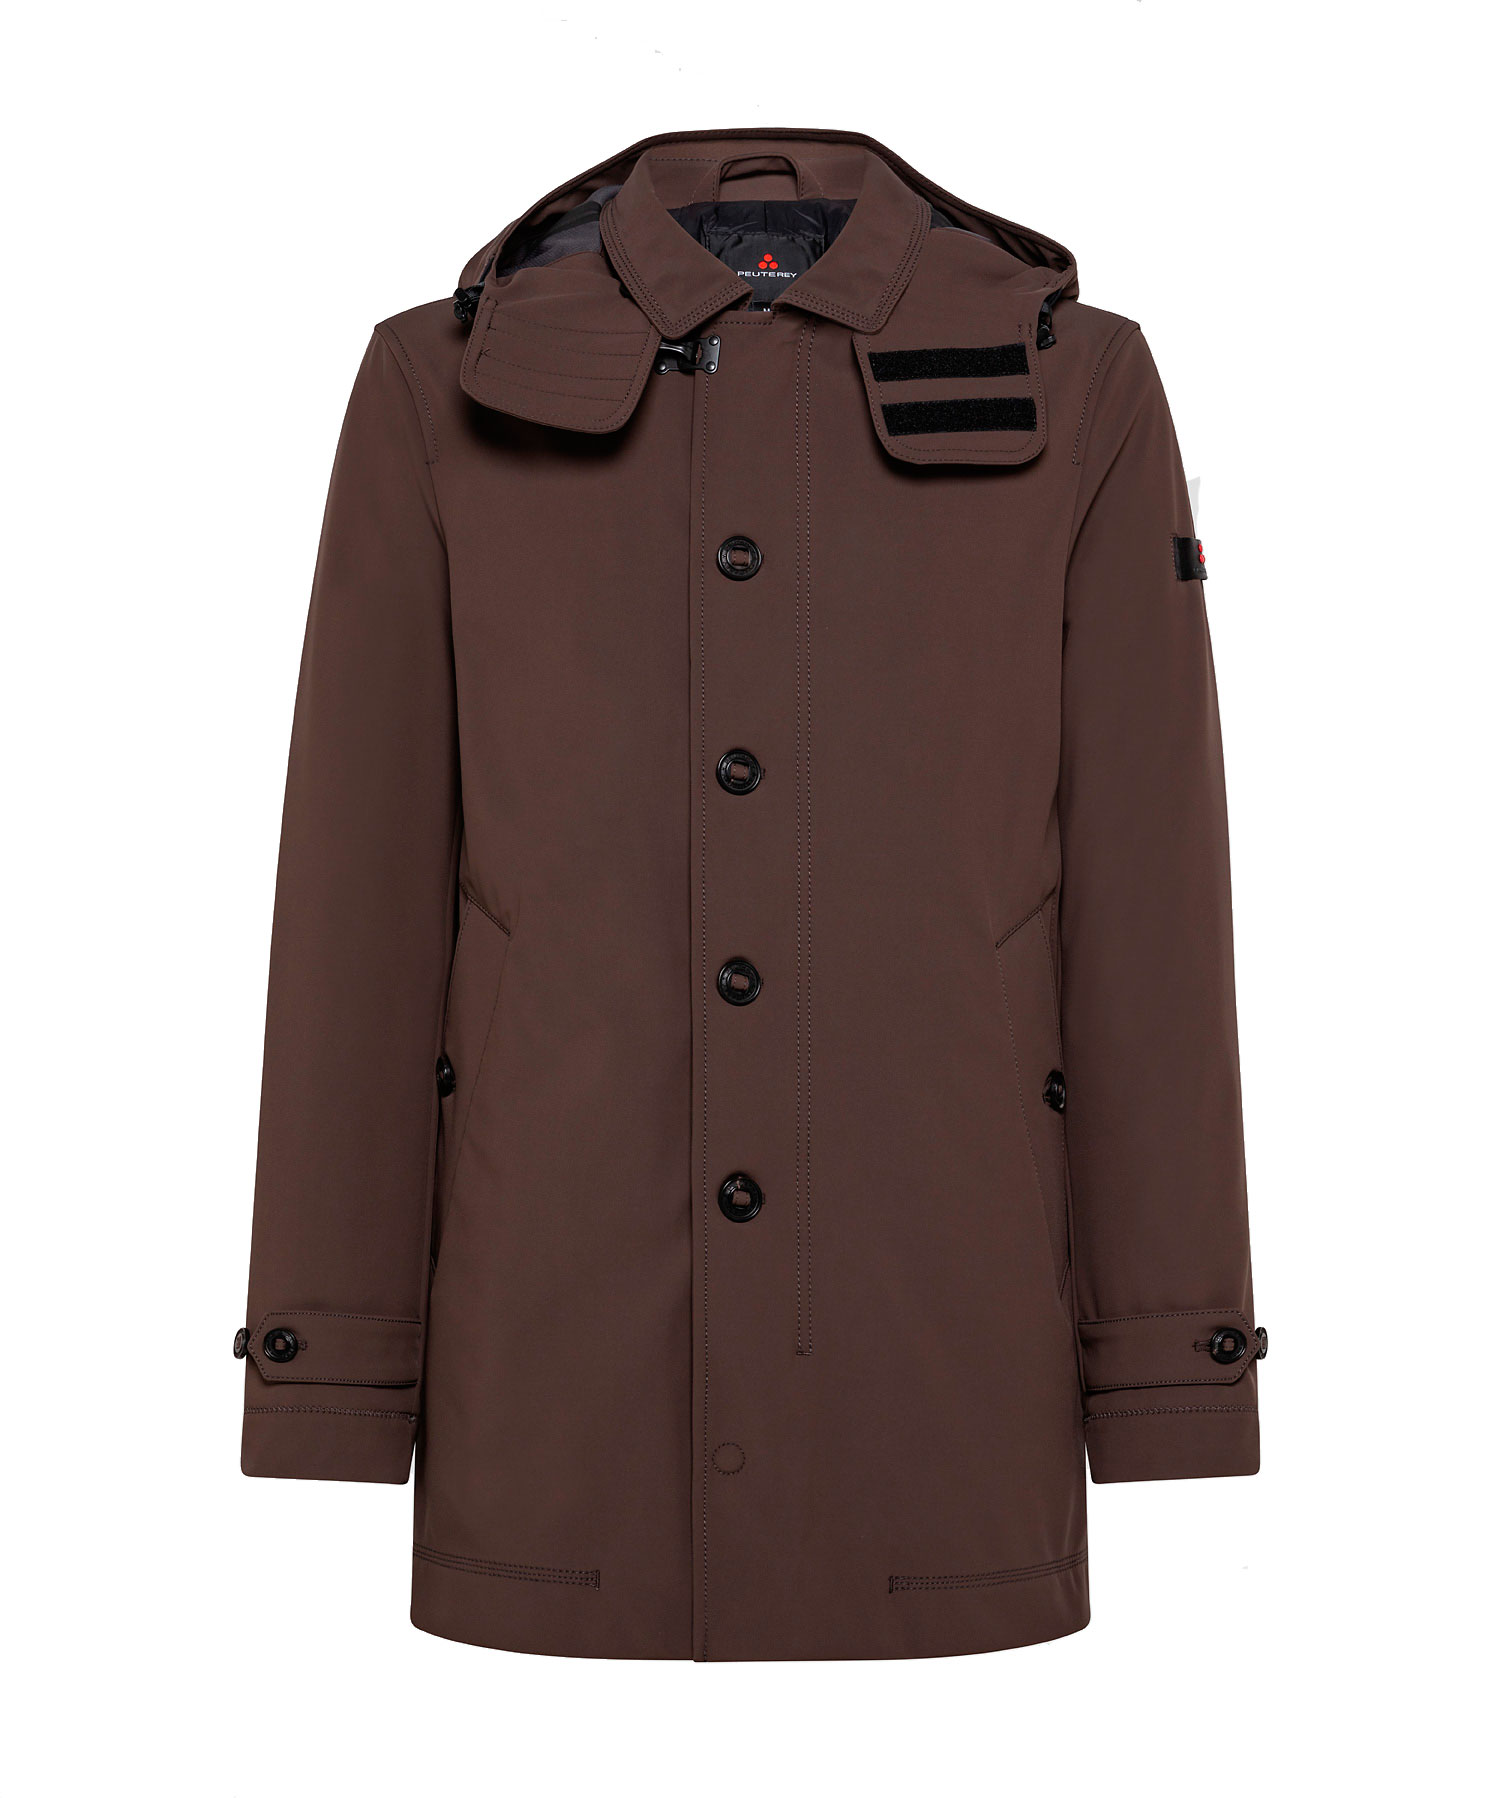 Trebbio kp01 - Padded technical trench coat PEUTEREY | Coat | PEU3700301